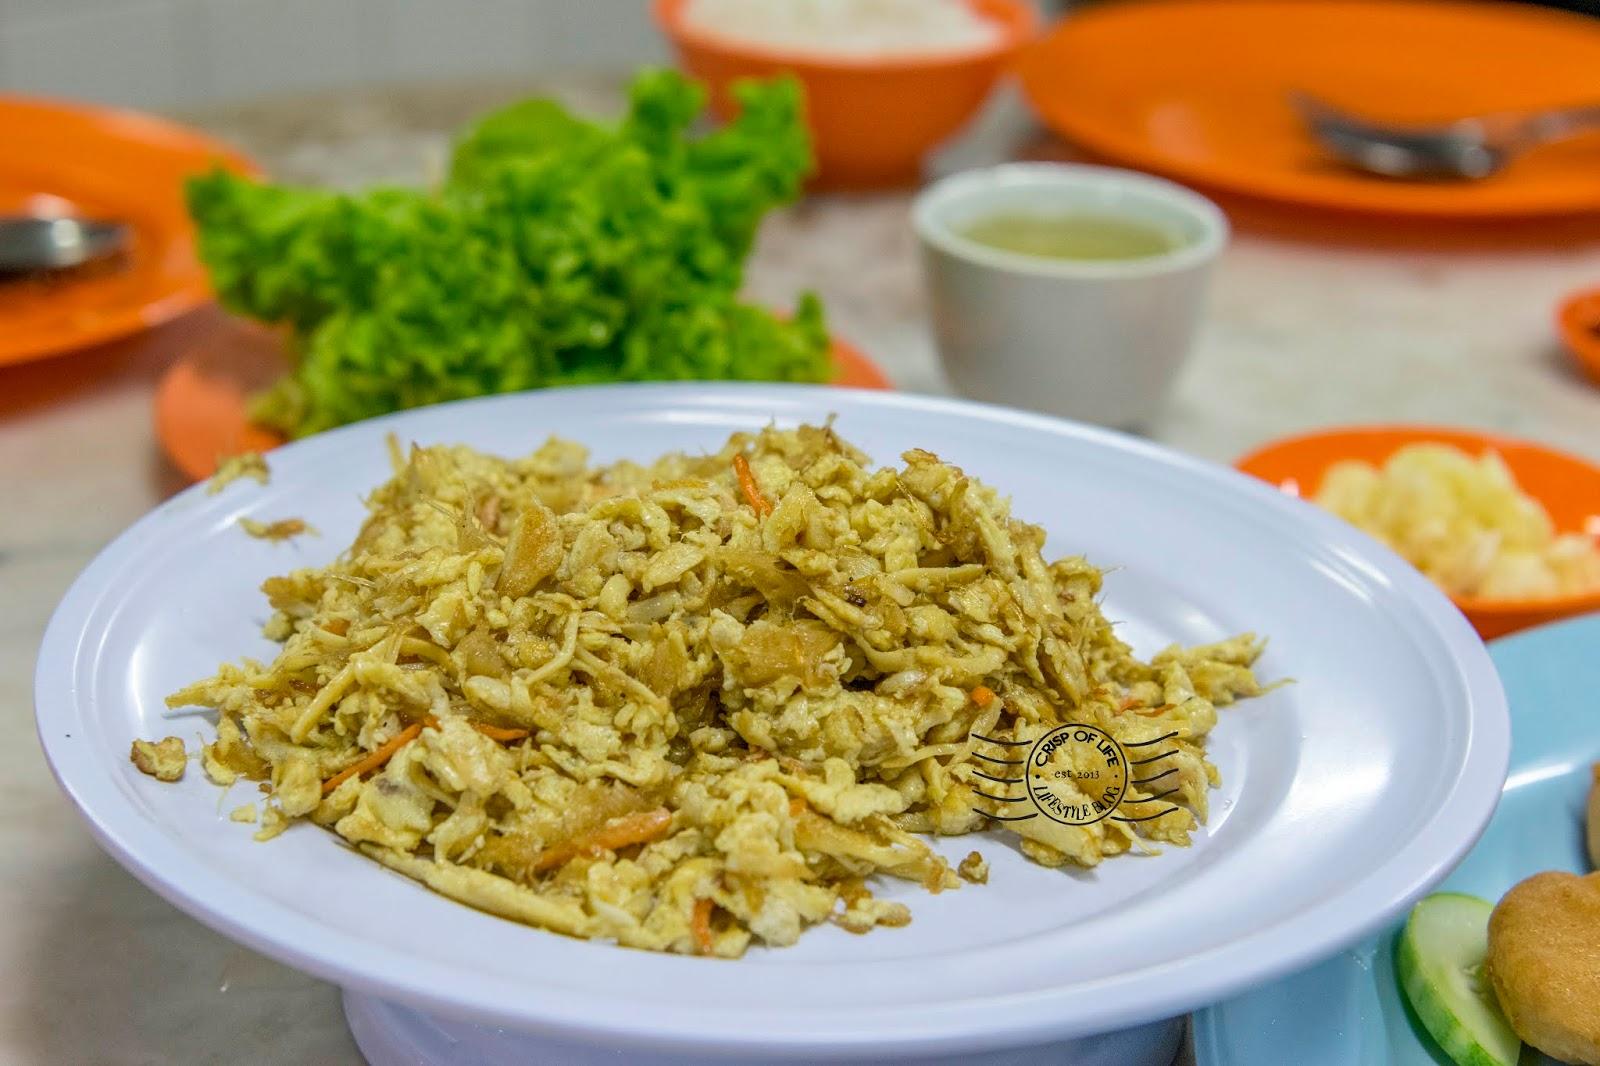 Boey Chong Kee Restaurant @ Lebuh Cintra, Georgetown, Penang